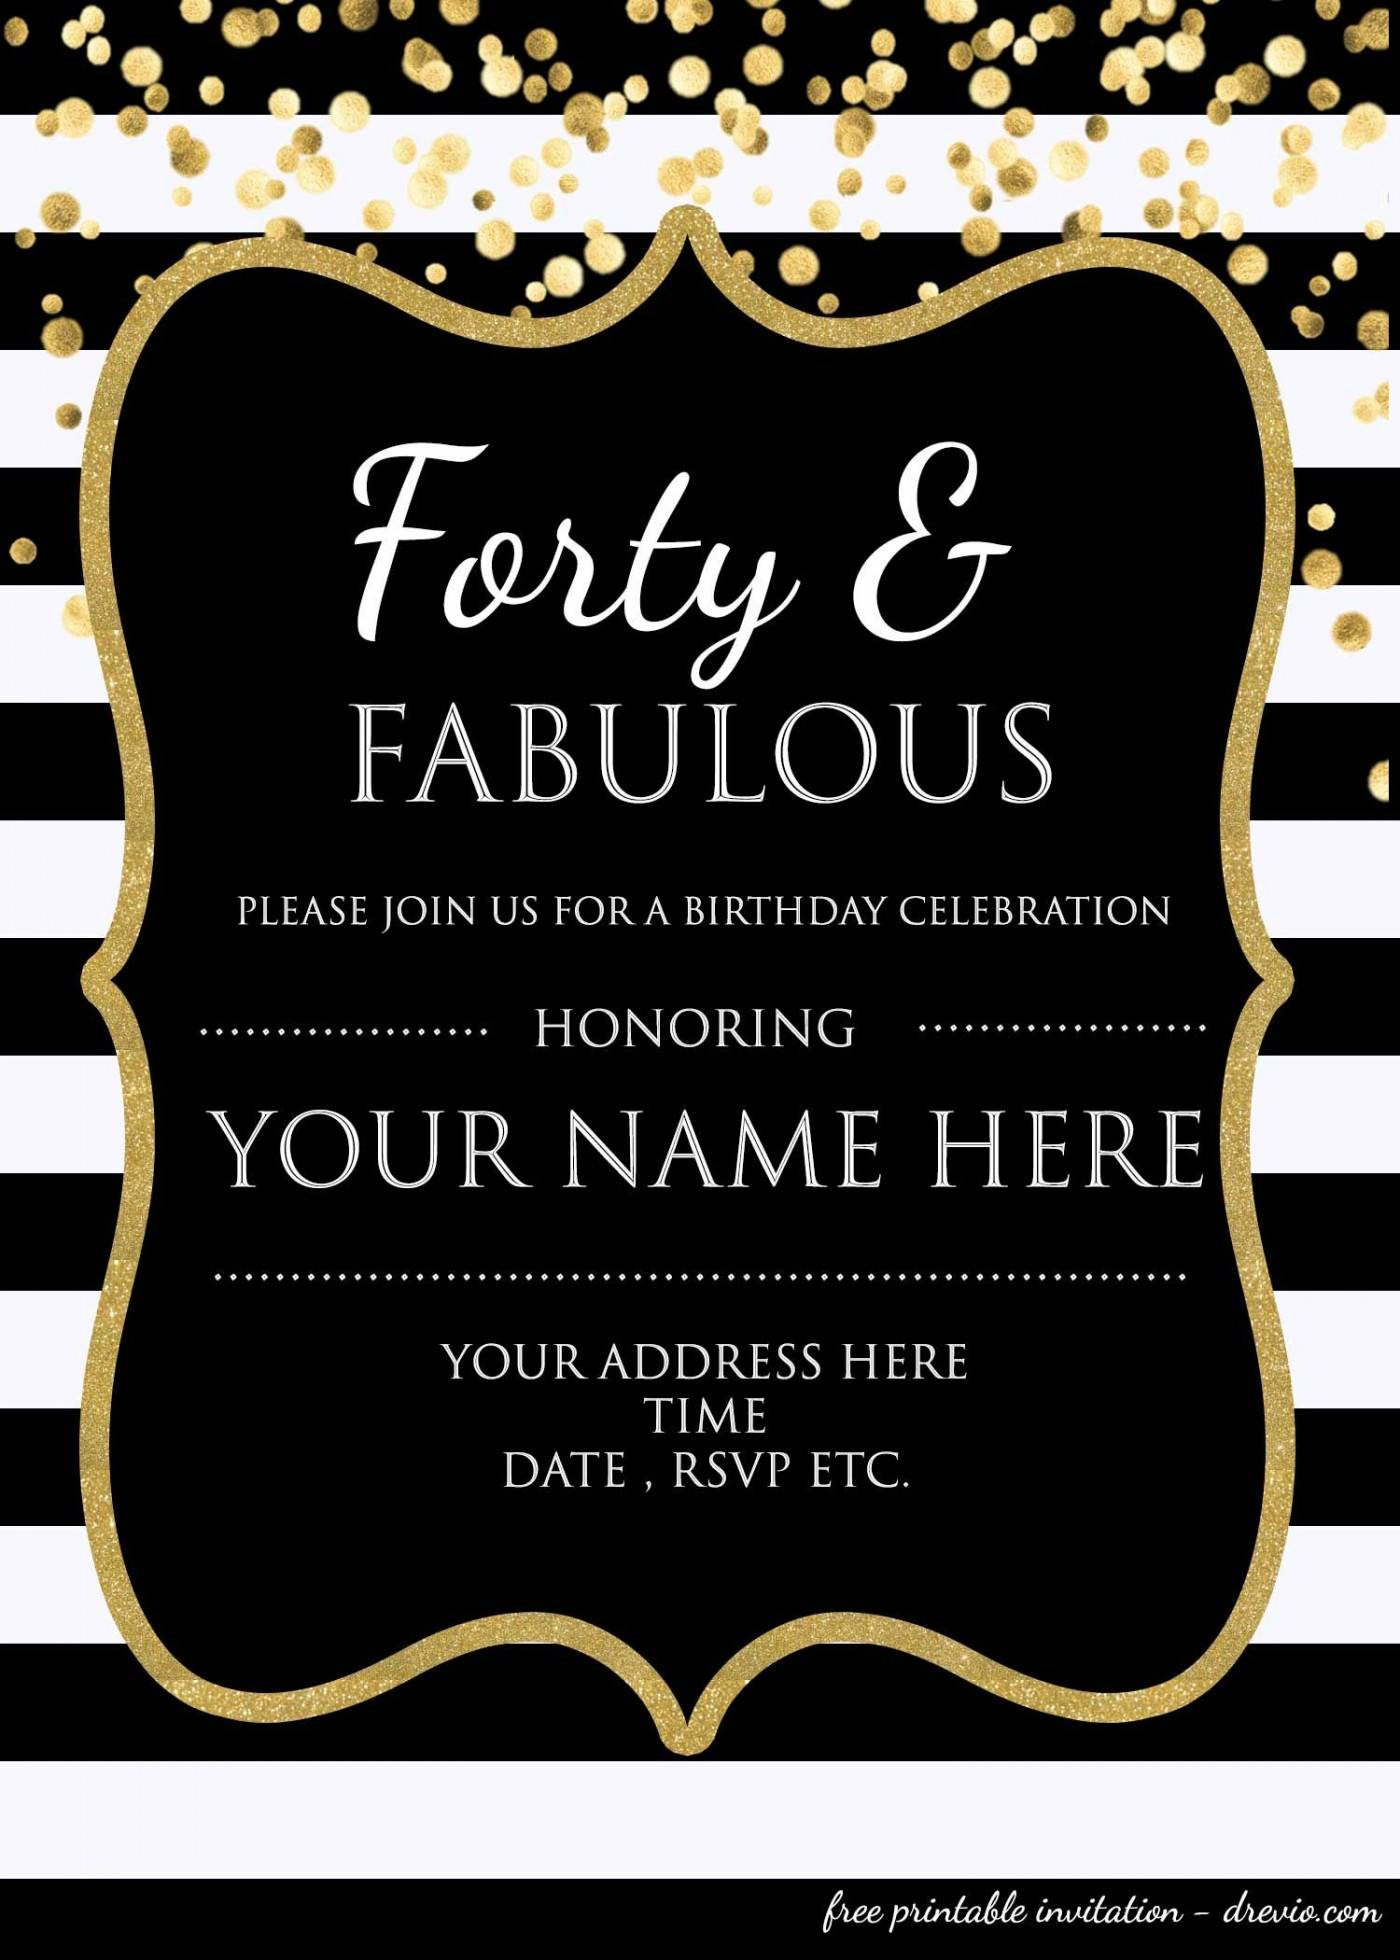 Templates For 40th Birthday Invitations